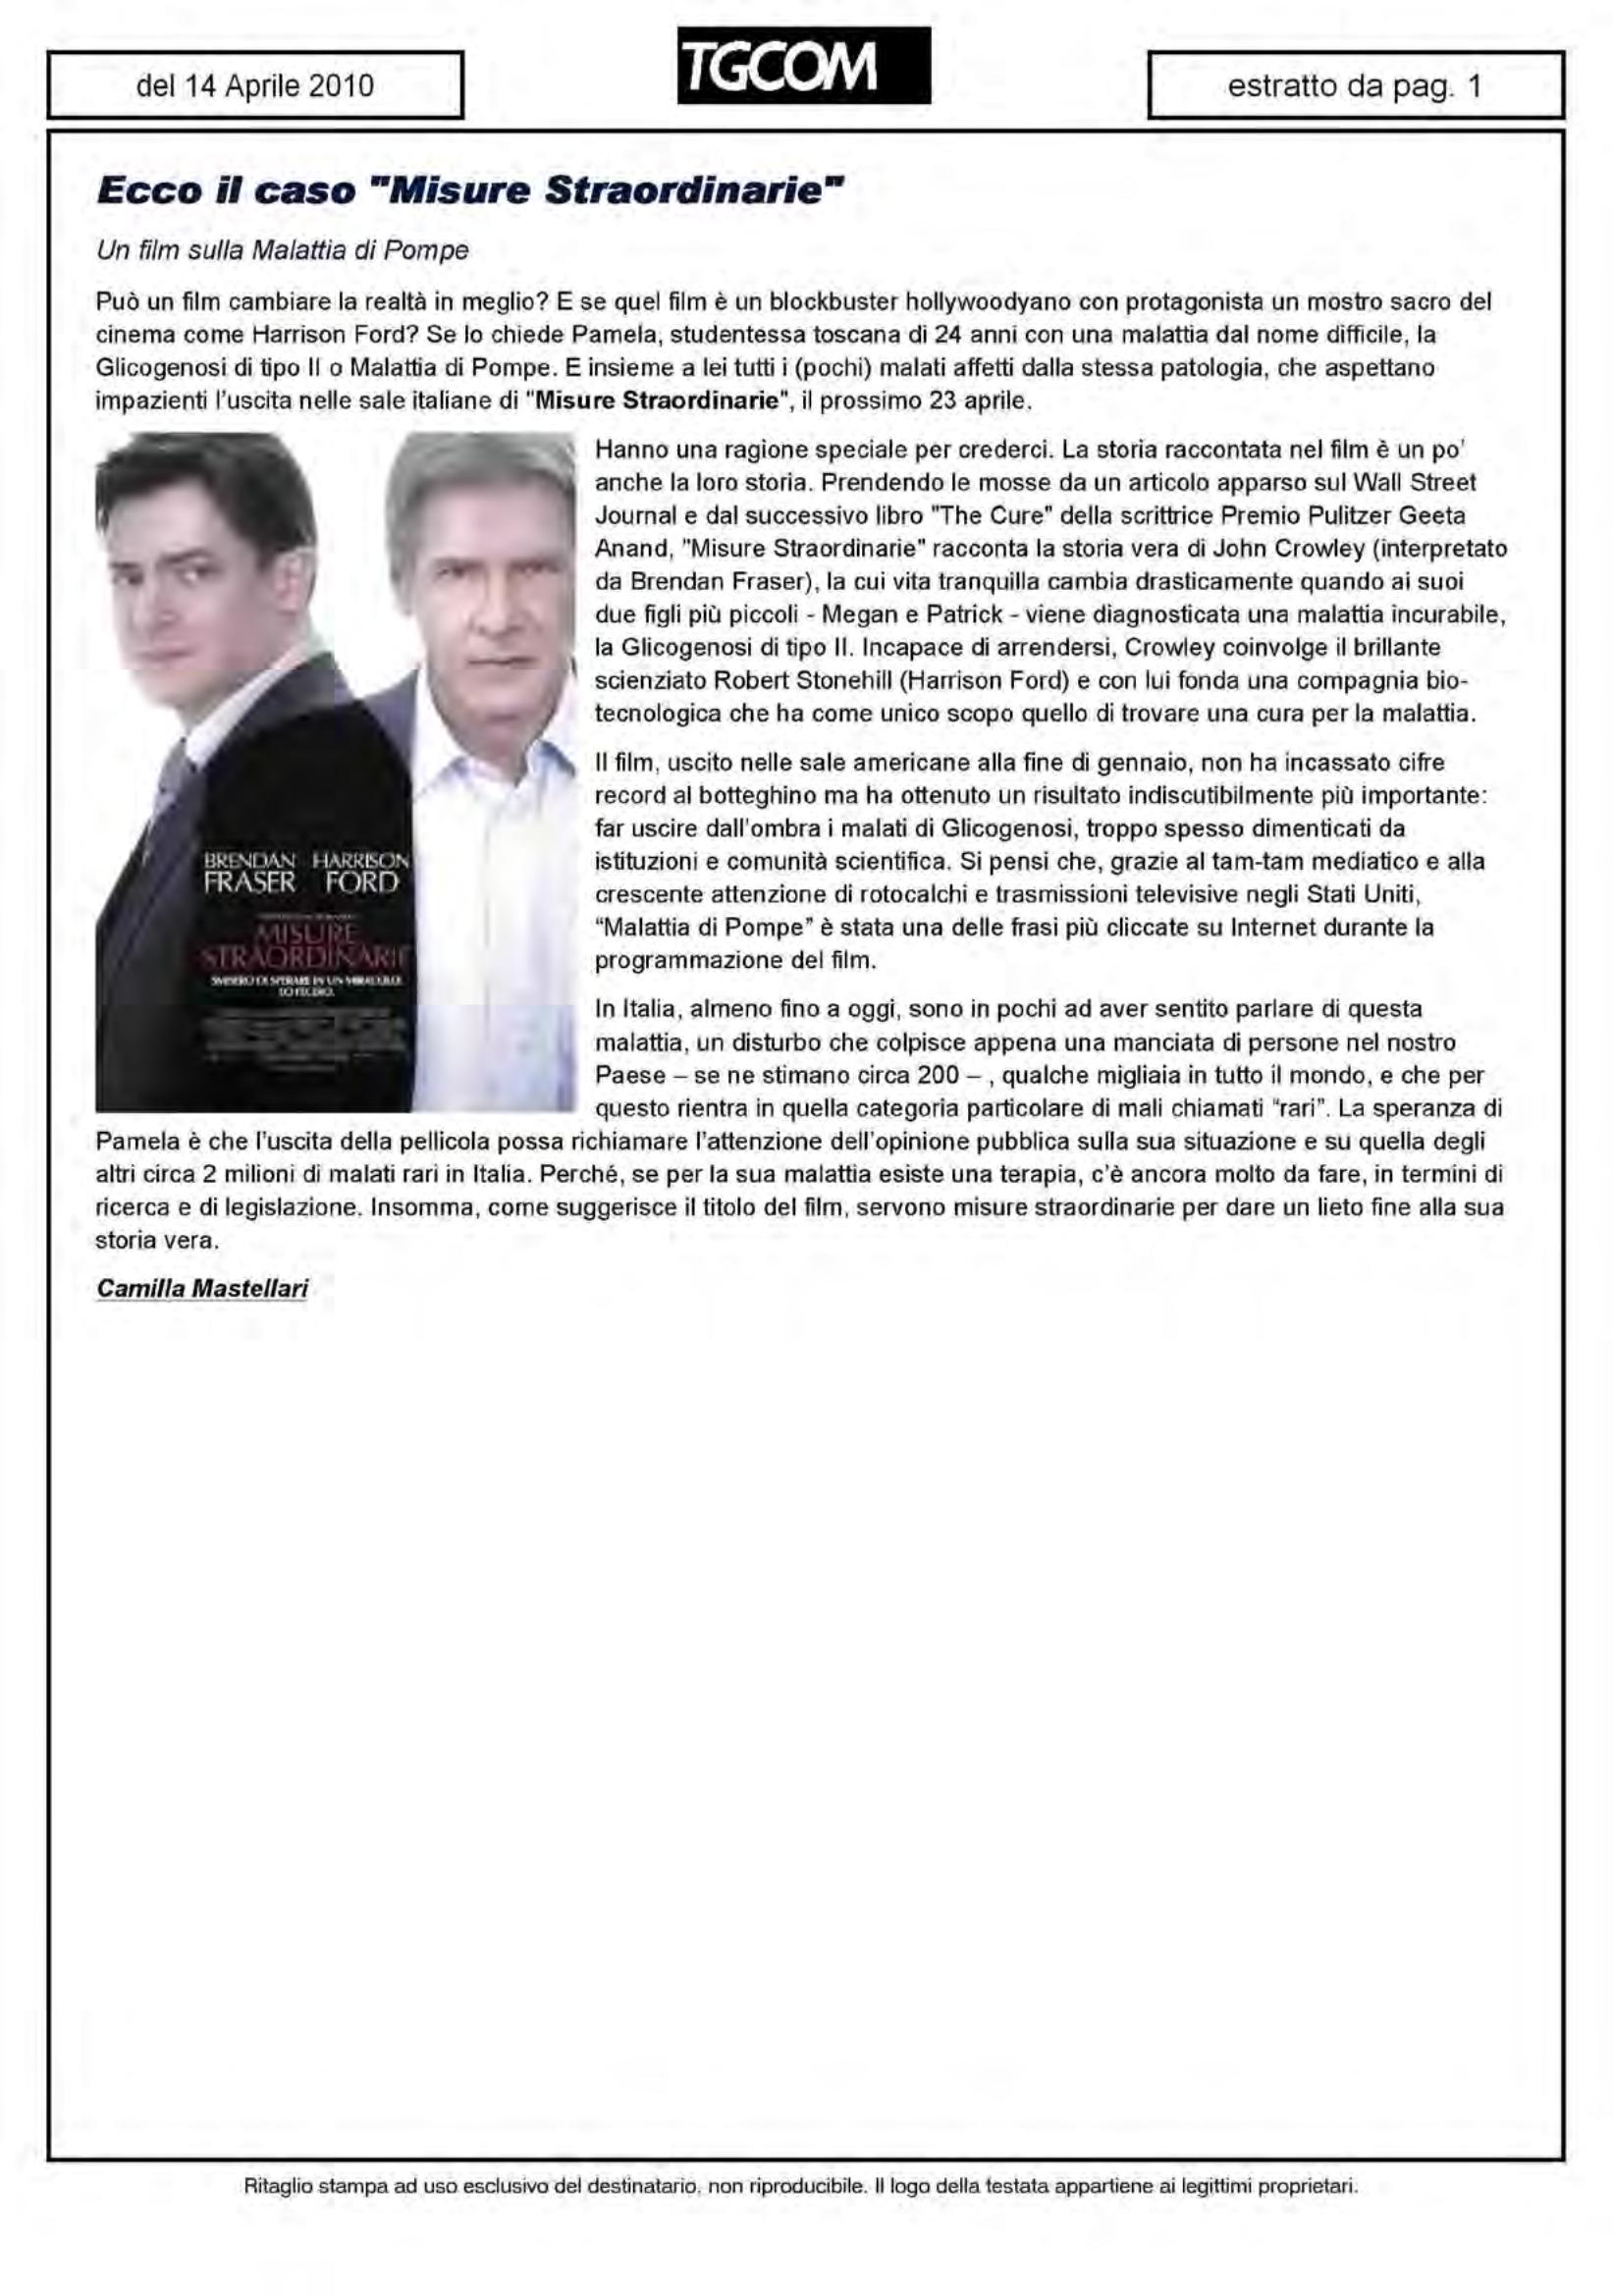 Stampa_20100422_misure straordinarie_Page_38